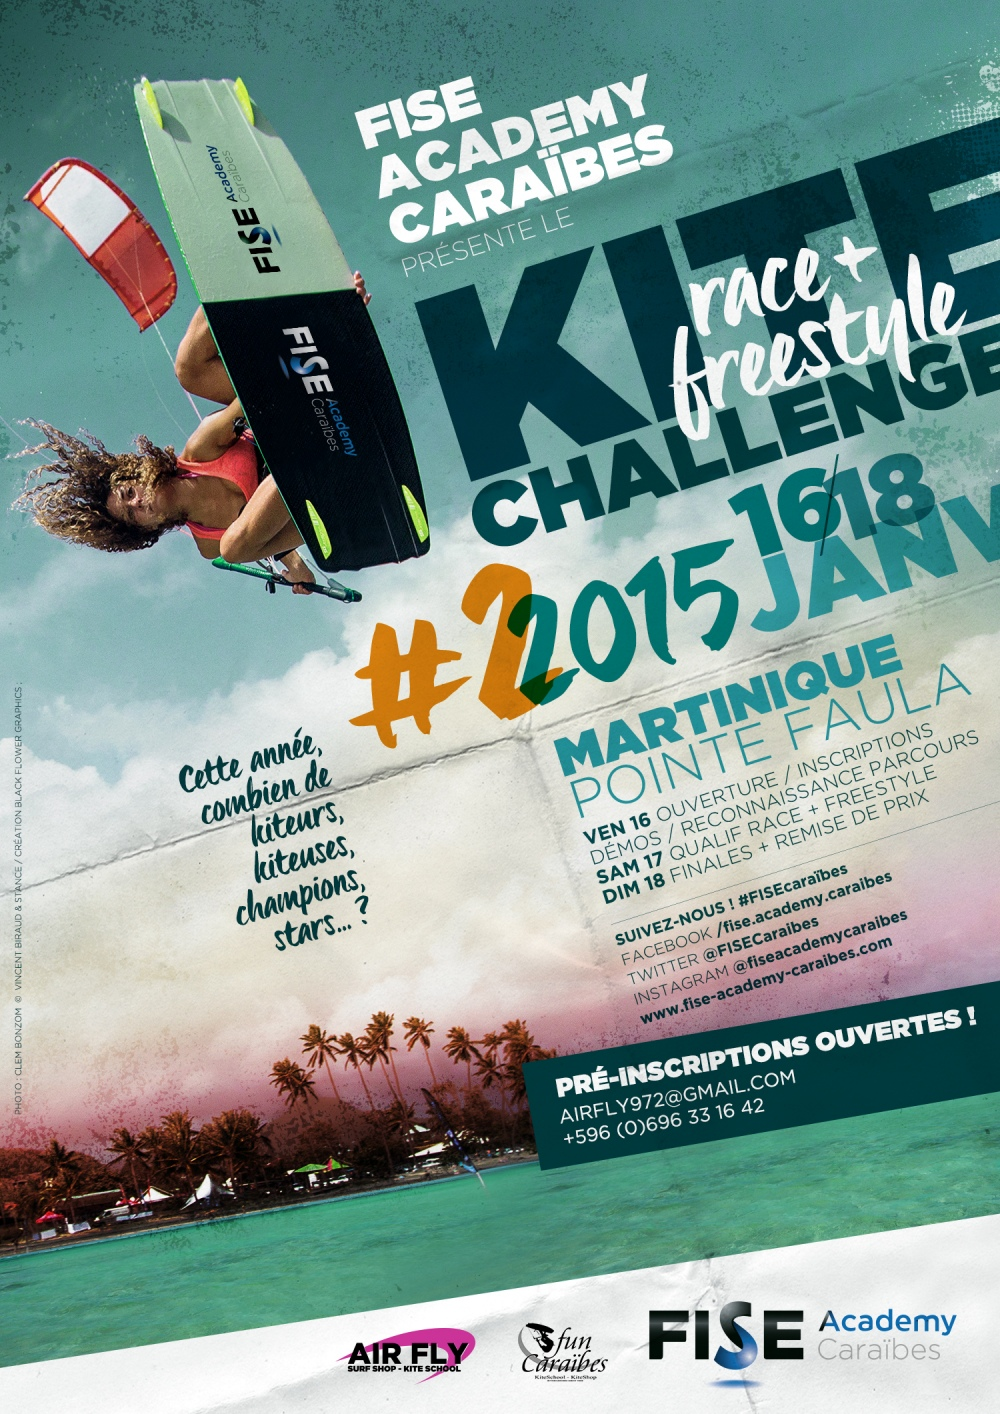 Kite Challenge 2015 du FISE ACADEMY CARAIBES